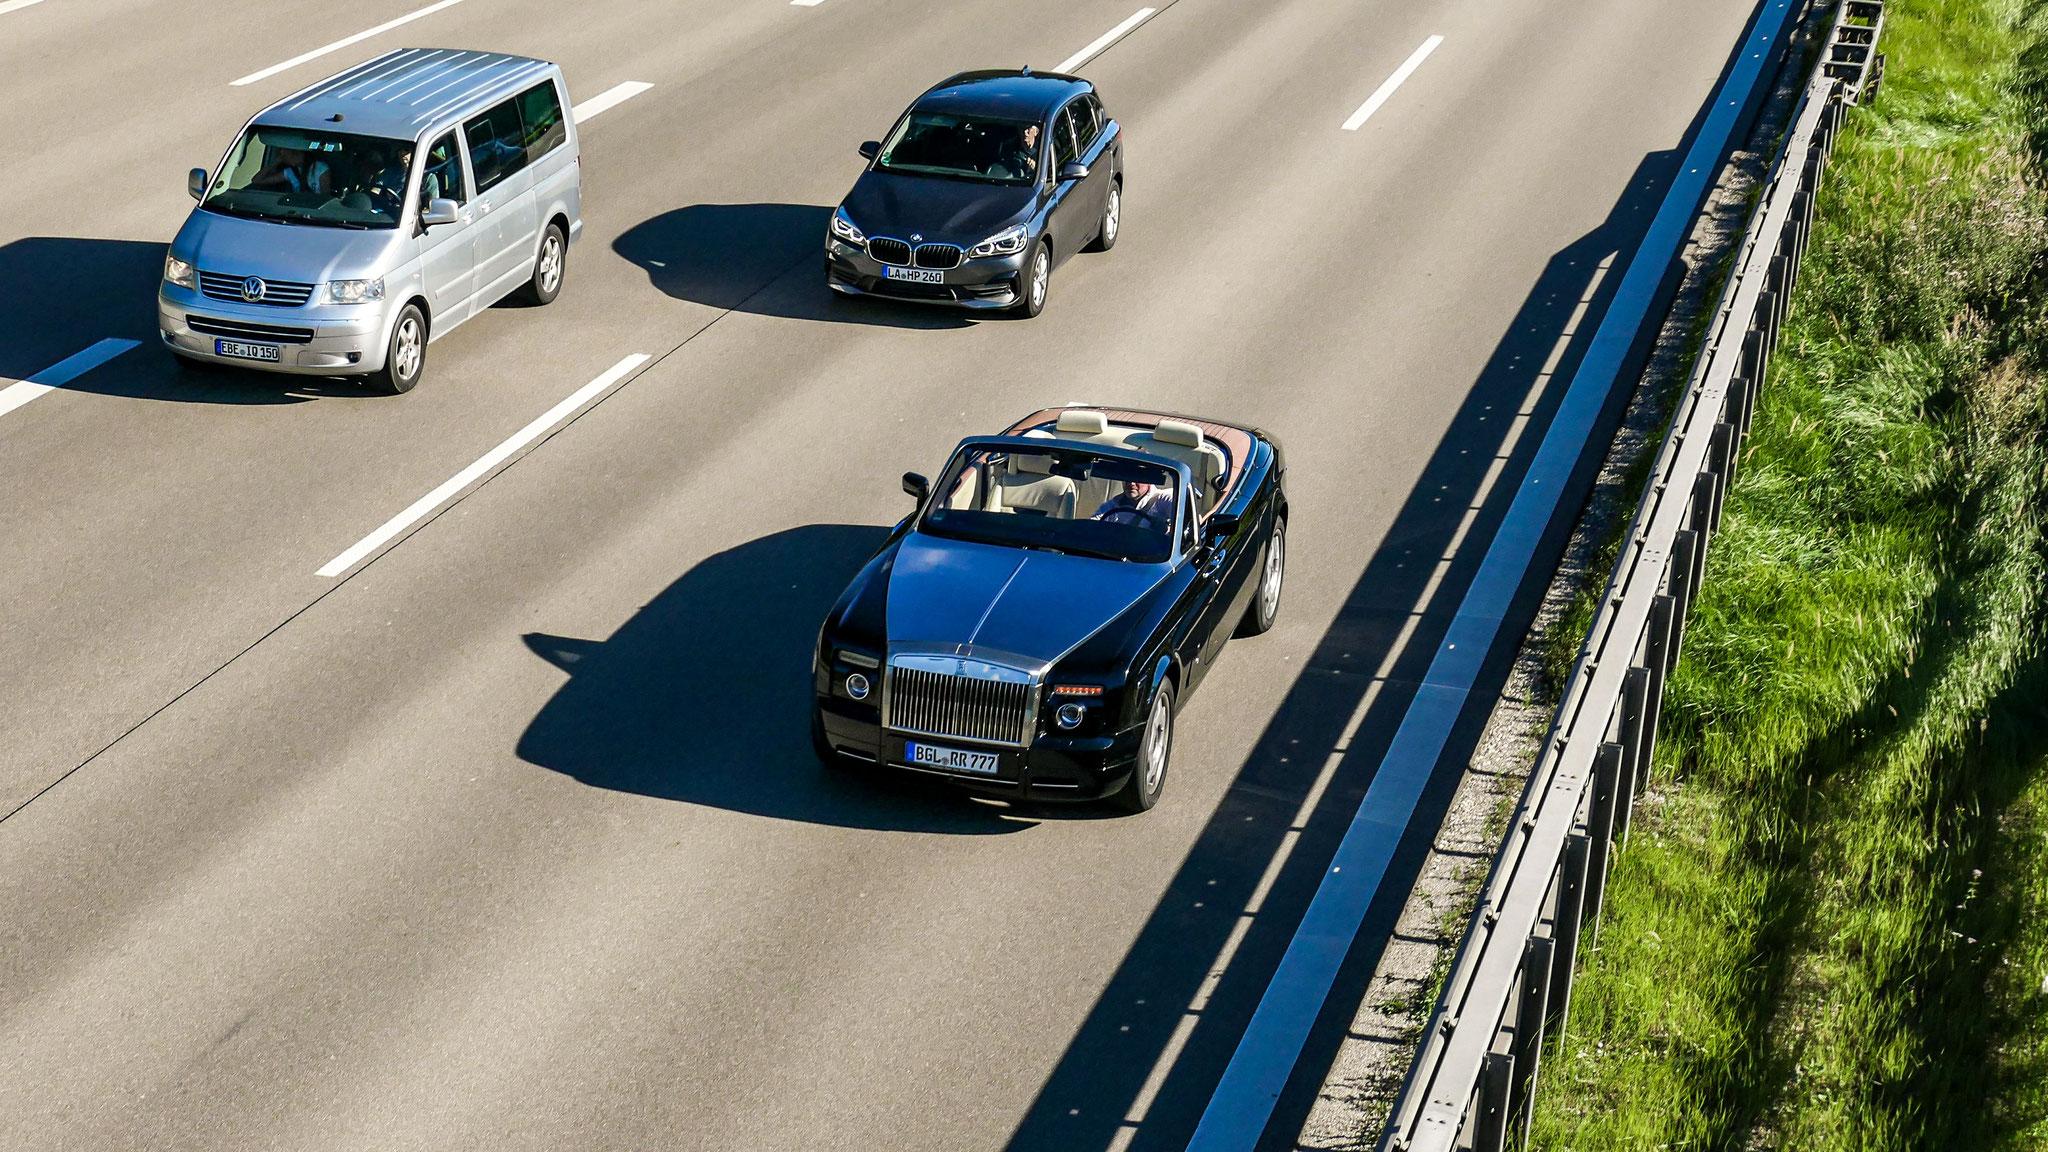 Rolls Royce Drophead - BGL-RR-777